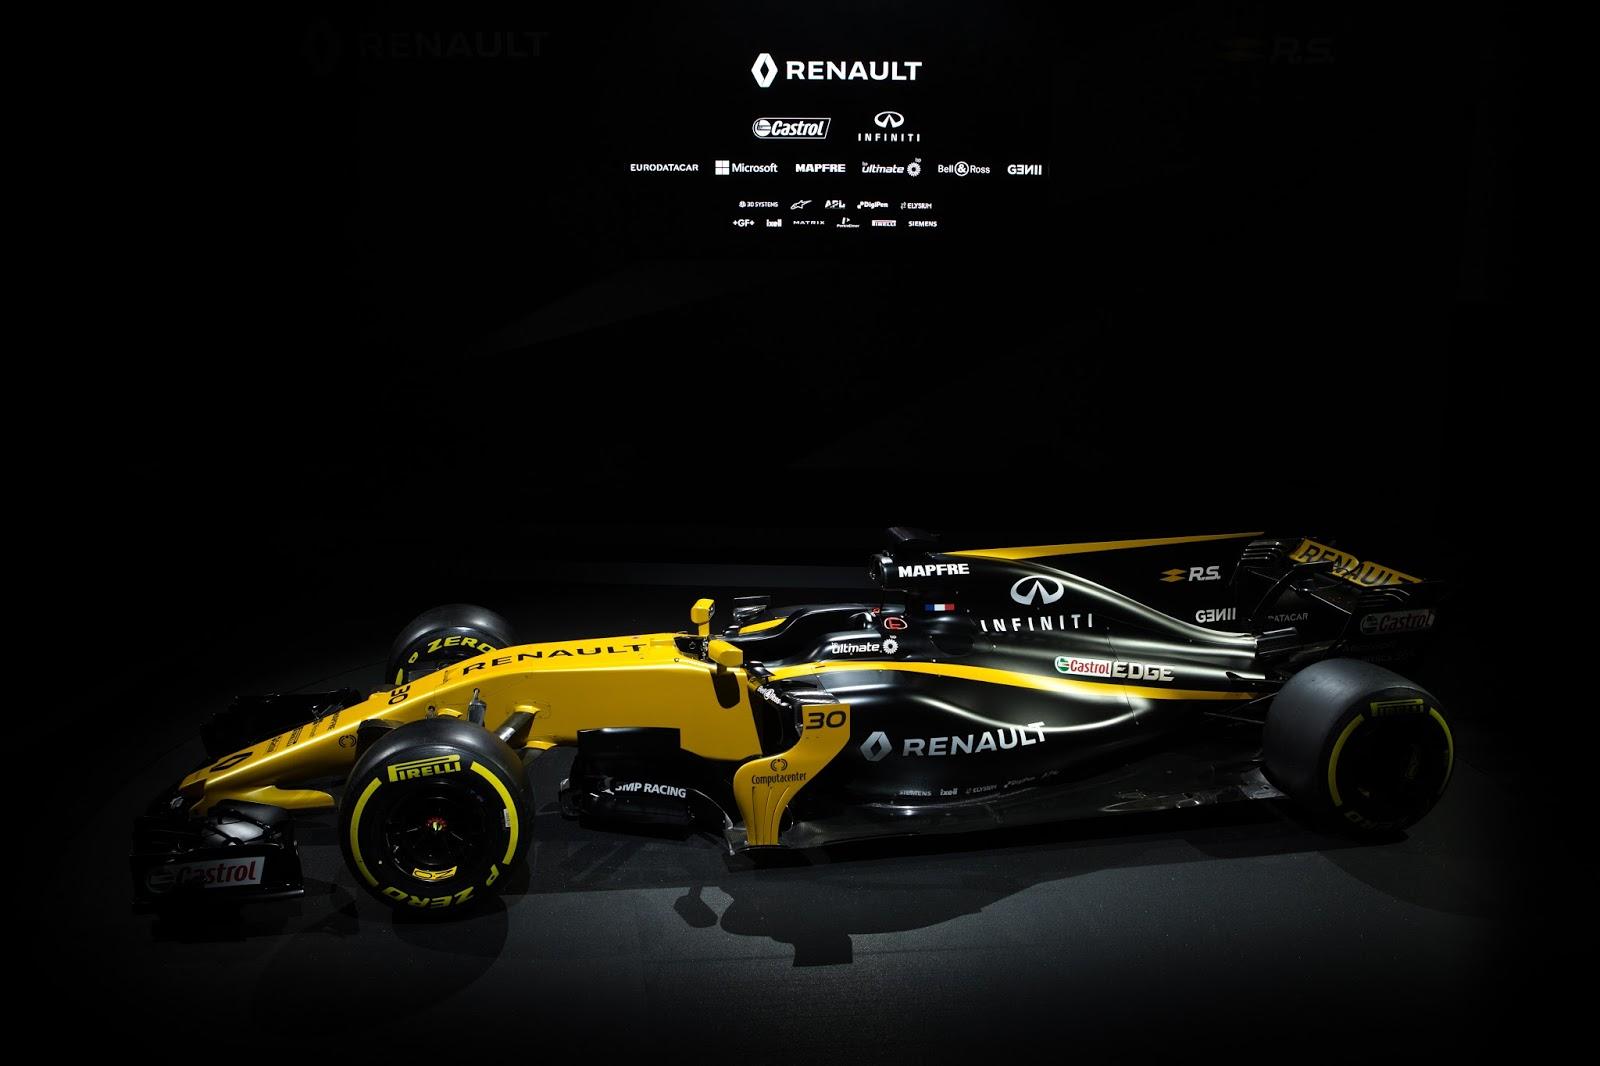 210217 RL 005 1 Η Renault Sport παρουσίασε το καινούργιο της μονοθέσιο, την R.S.17 F1, Formula 1, Renault, Renault Sport Formula 1 Team, videos